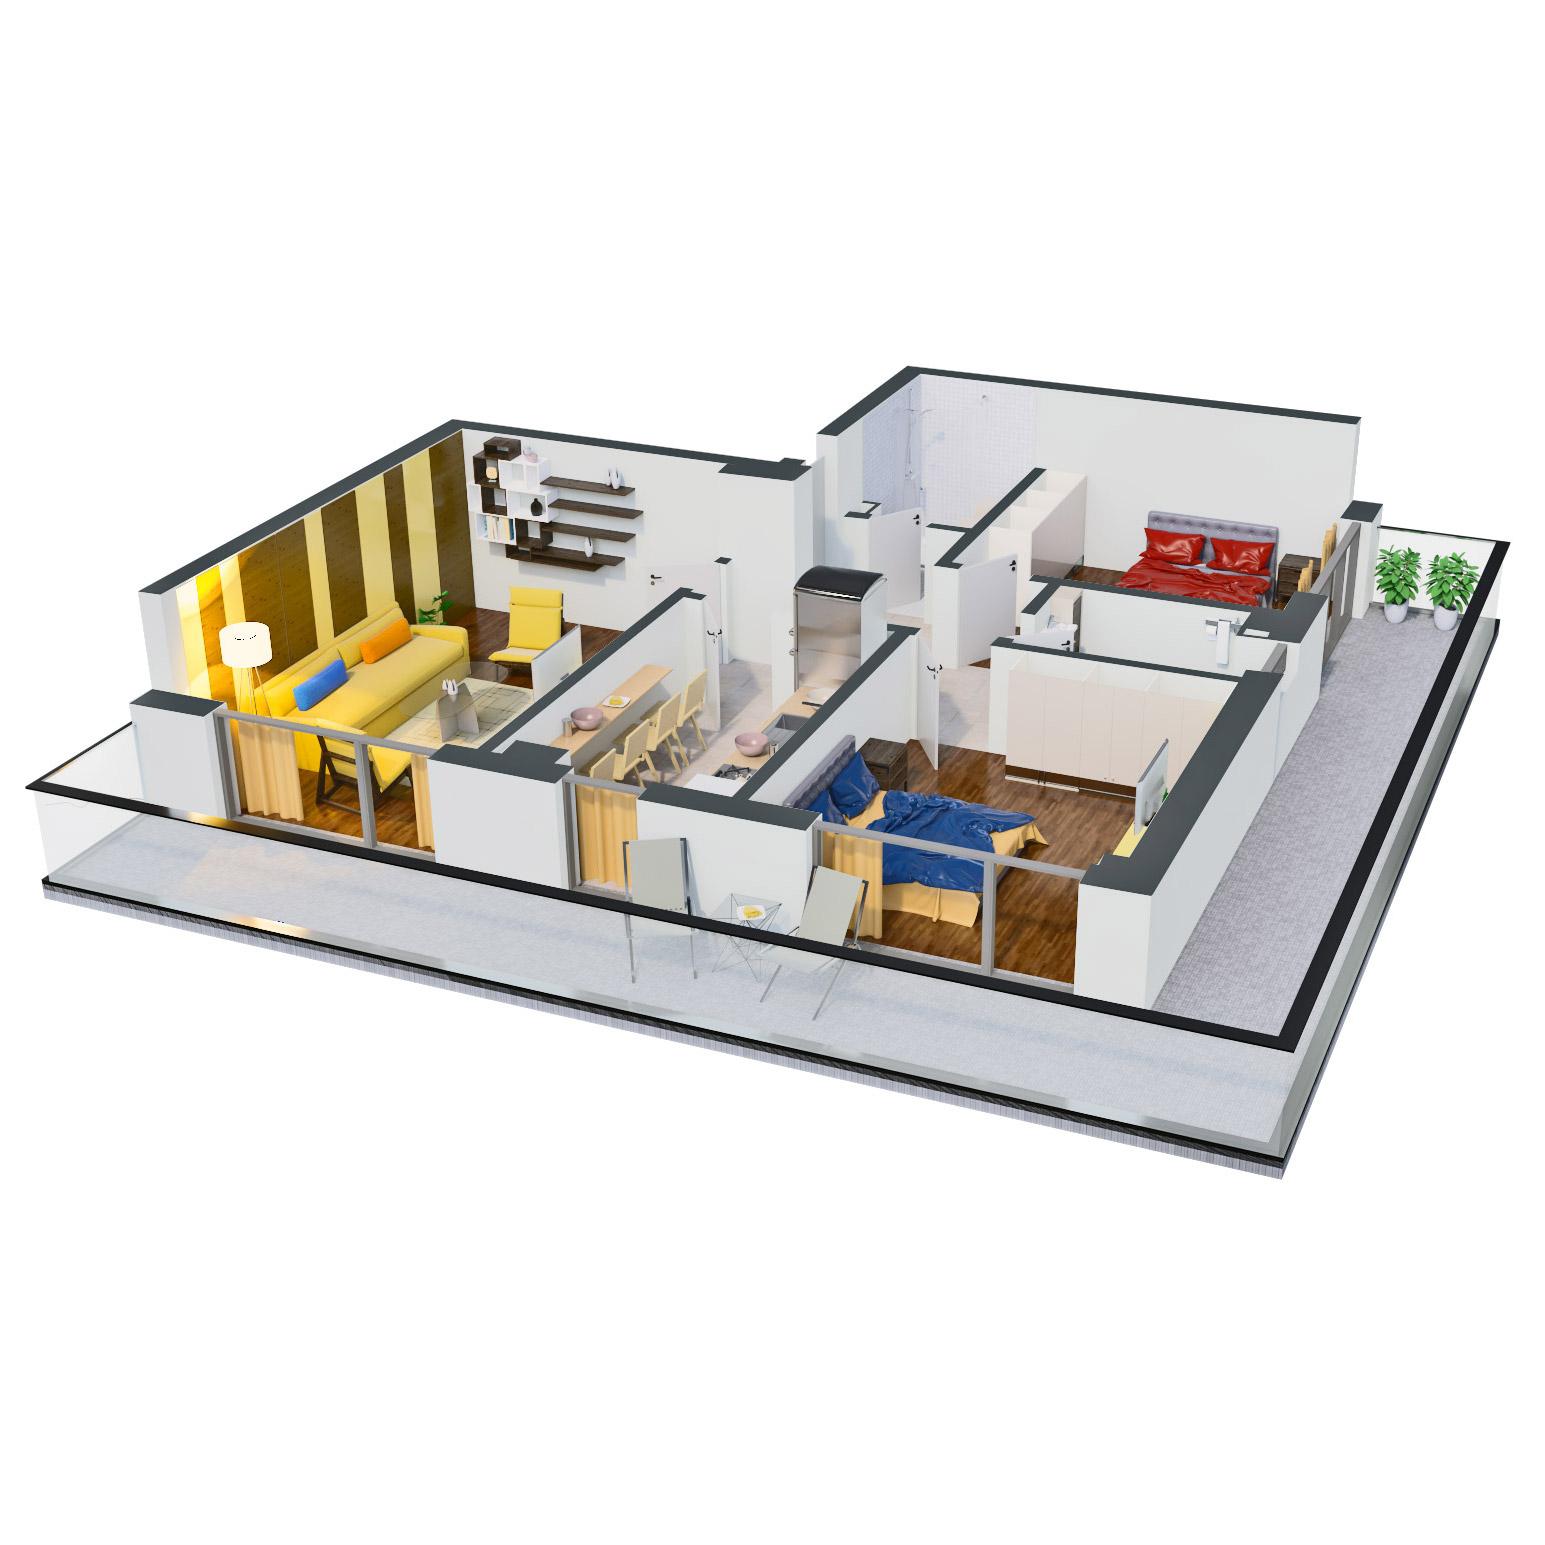 Apartament 3 camere de vanzare Bucuresti - Catedral Residence - Marriott, Piata Unirii, 13 Septembrie, Izvor - Tip 6 - T2A - C